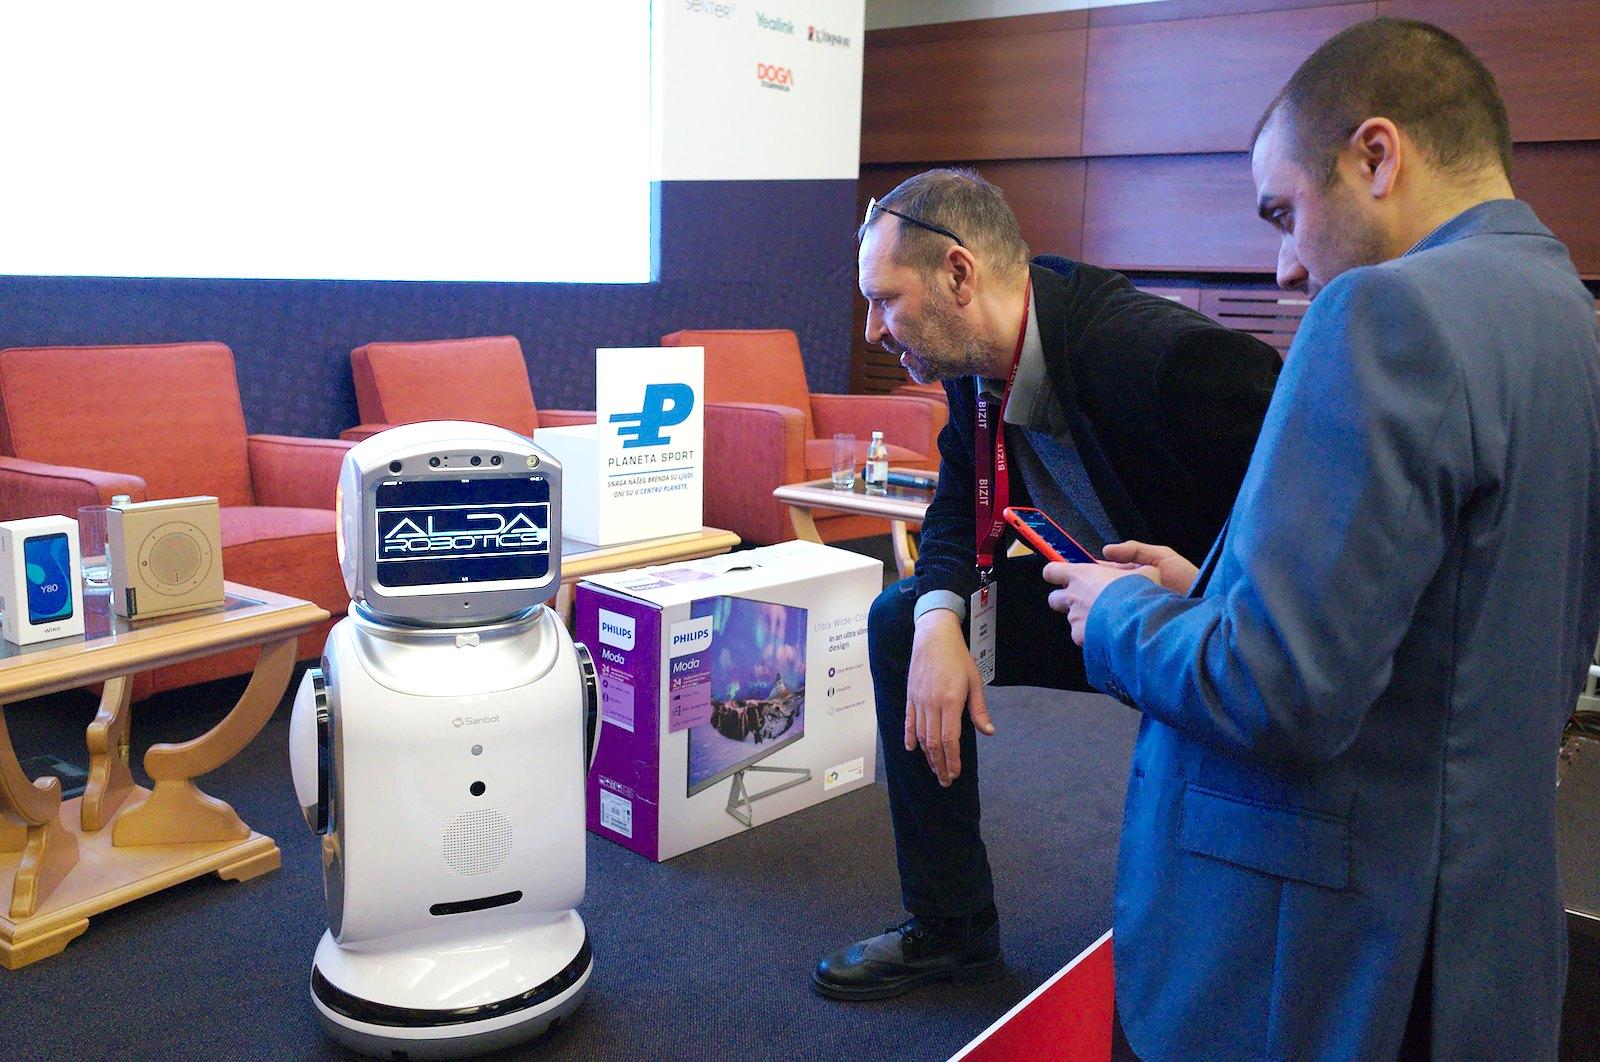 Nano ALDA Robotics